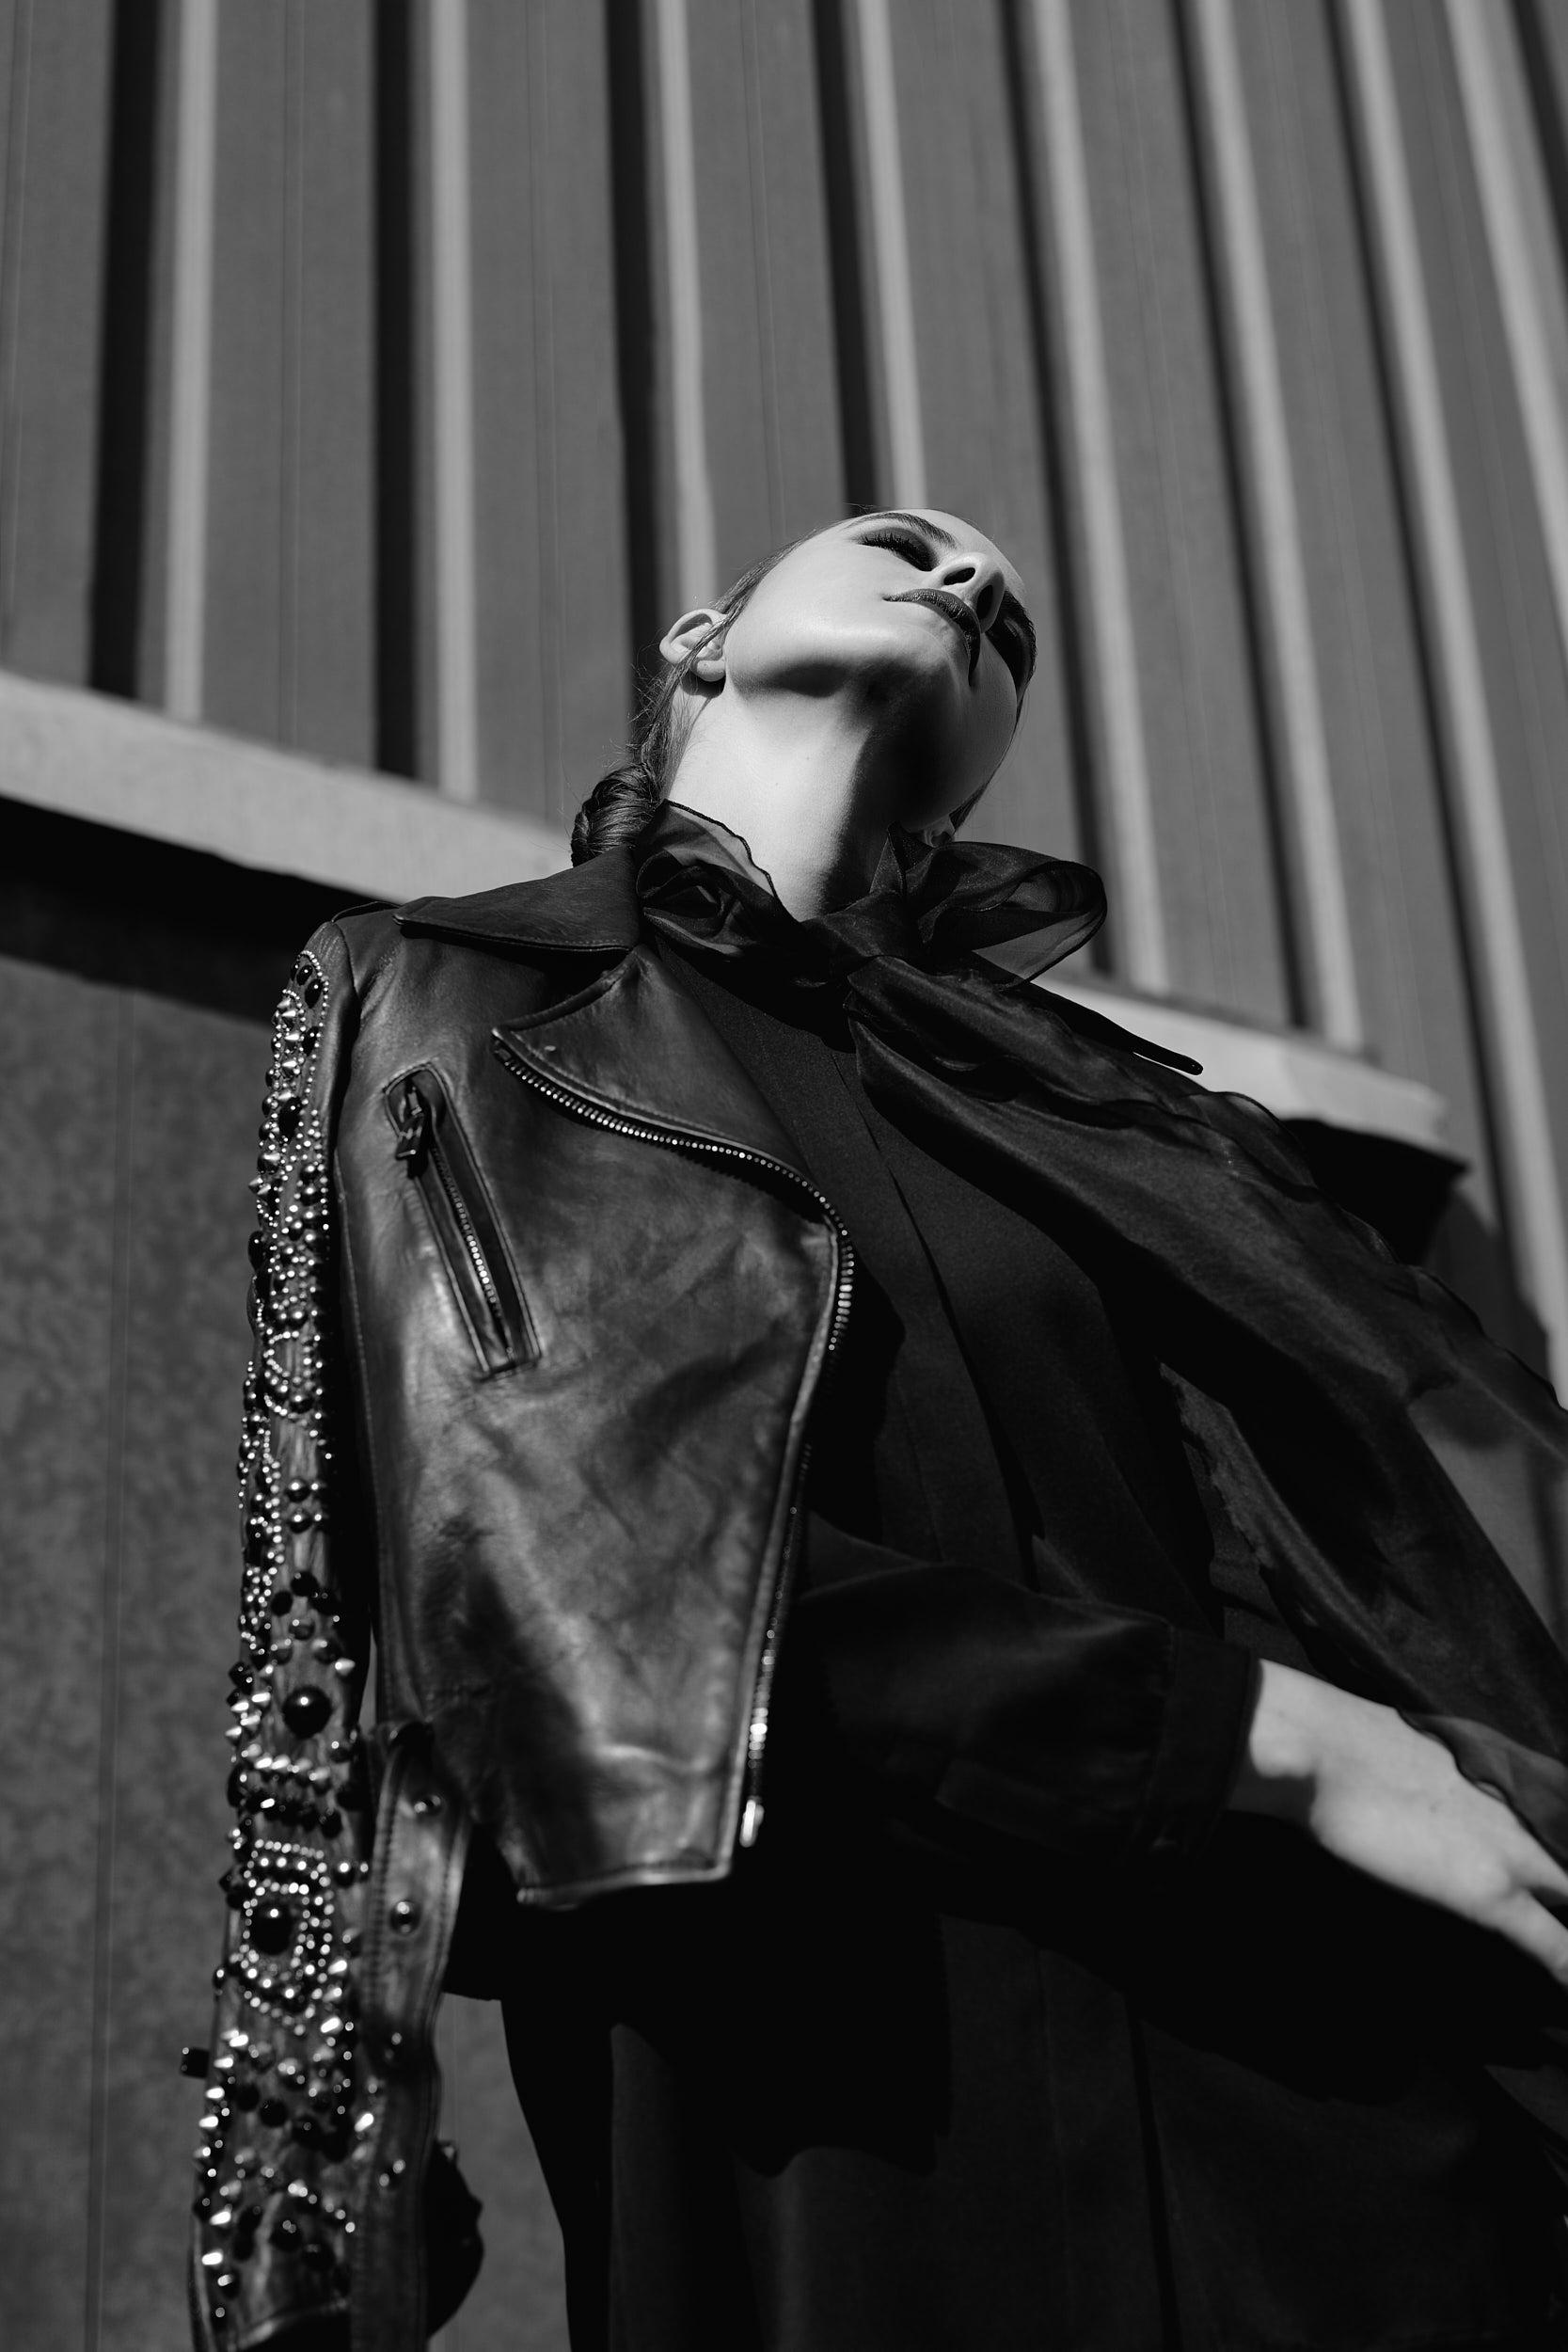 Joe Friend Photography | Fashion Photography | Fashion Editorial for Livid Magazine